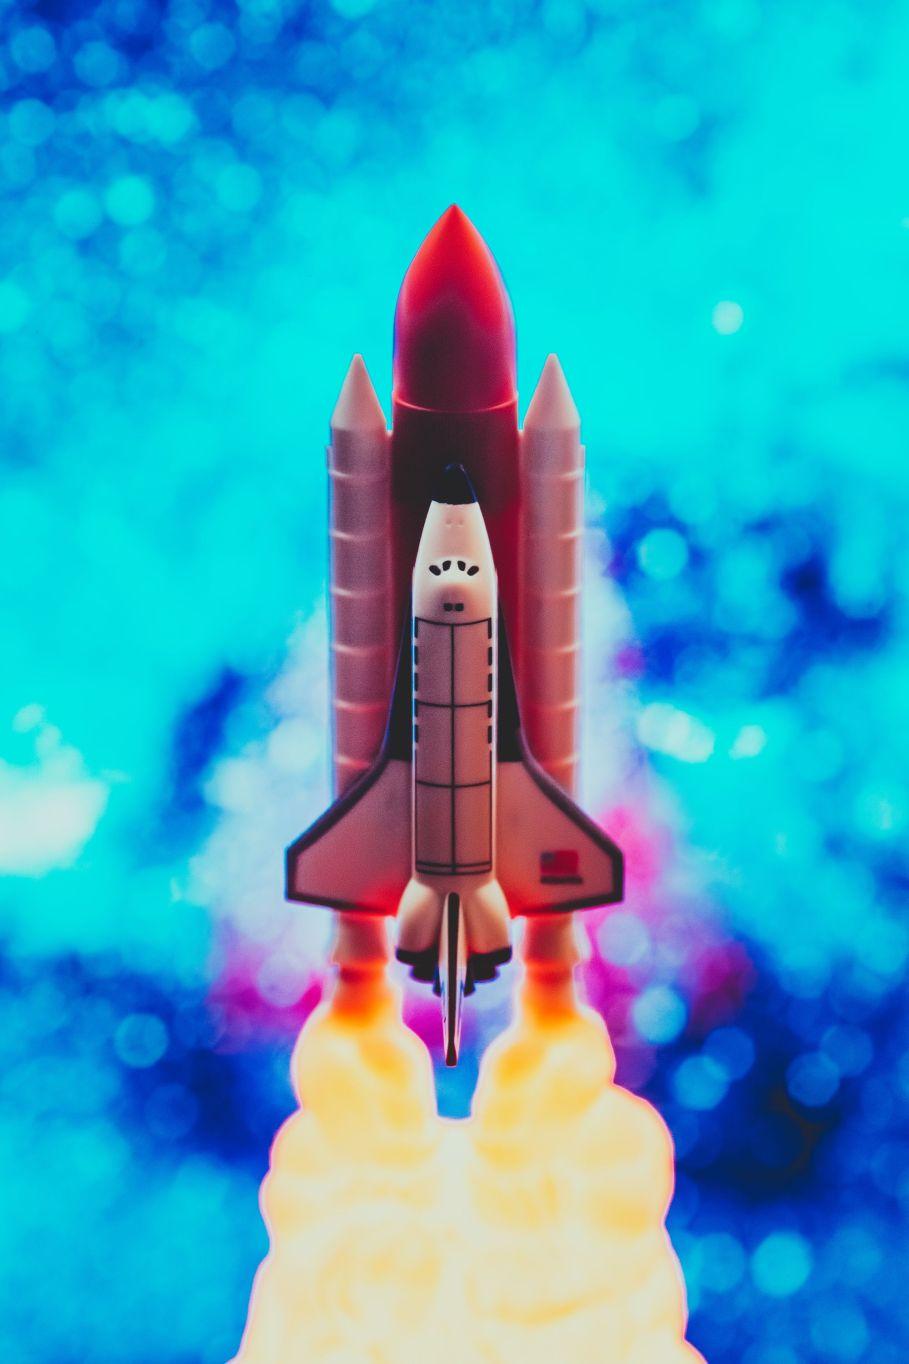 13 tips to improve PostgreSQL Insert performance